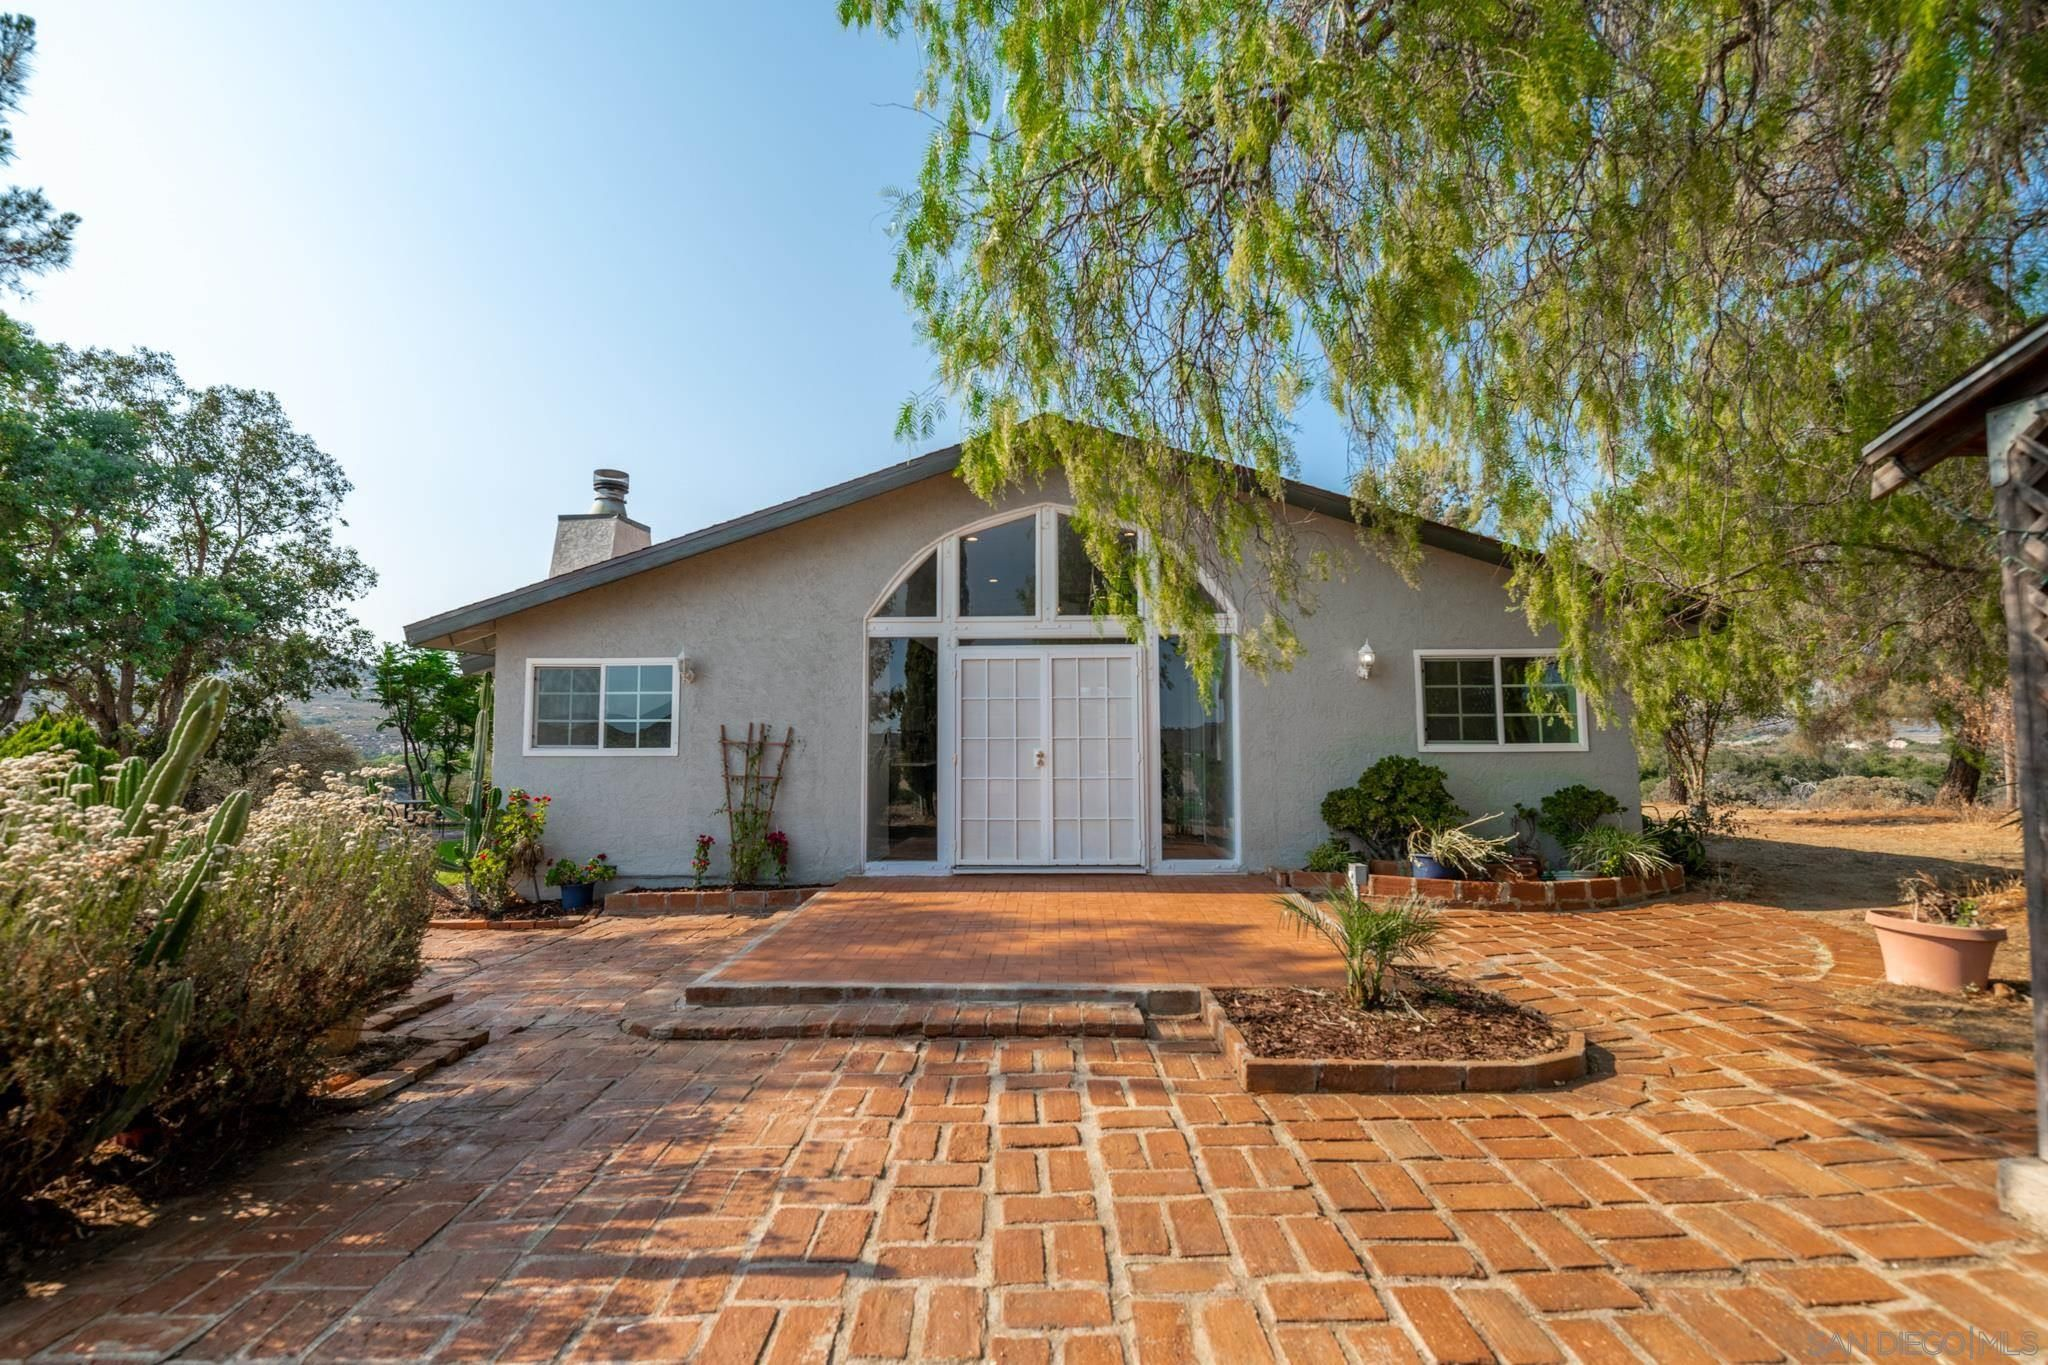 Main Photo: POTRERO House for sale : 6 bedrooms : 25511 Potrero Valley Rd